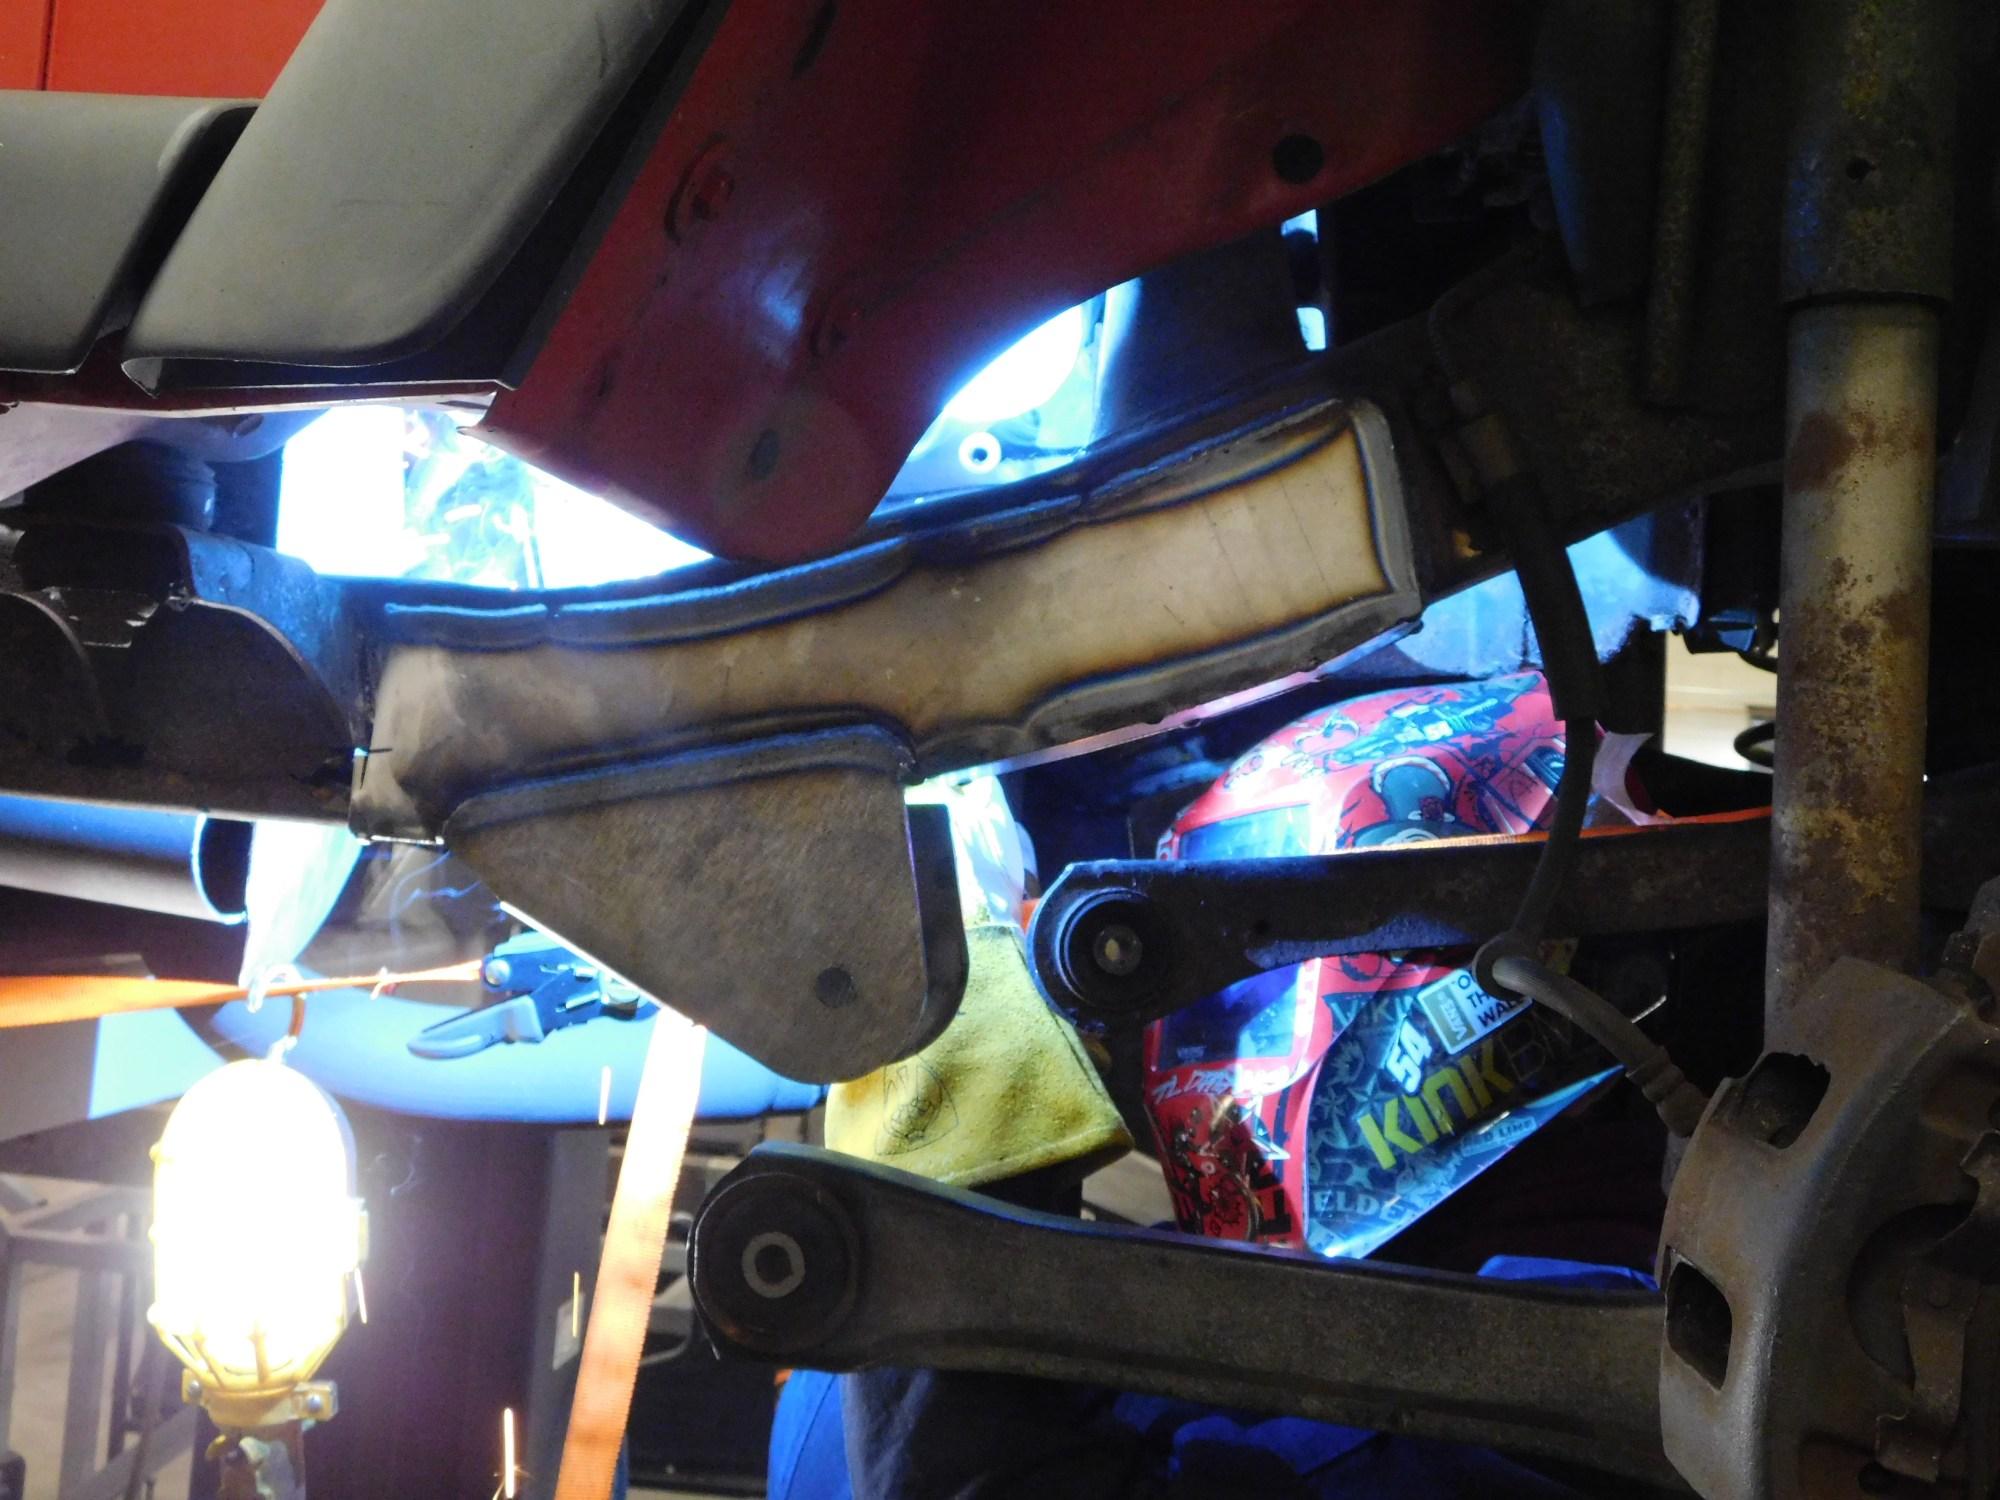 hight resolution of repair2 autorust bb 08 3x50wsh45 shipping room inventory karry welding 129 r